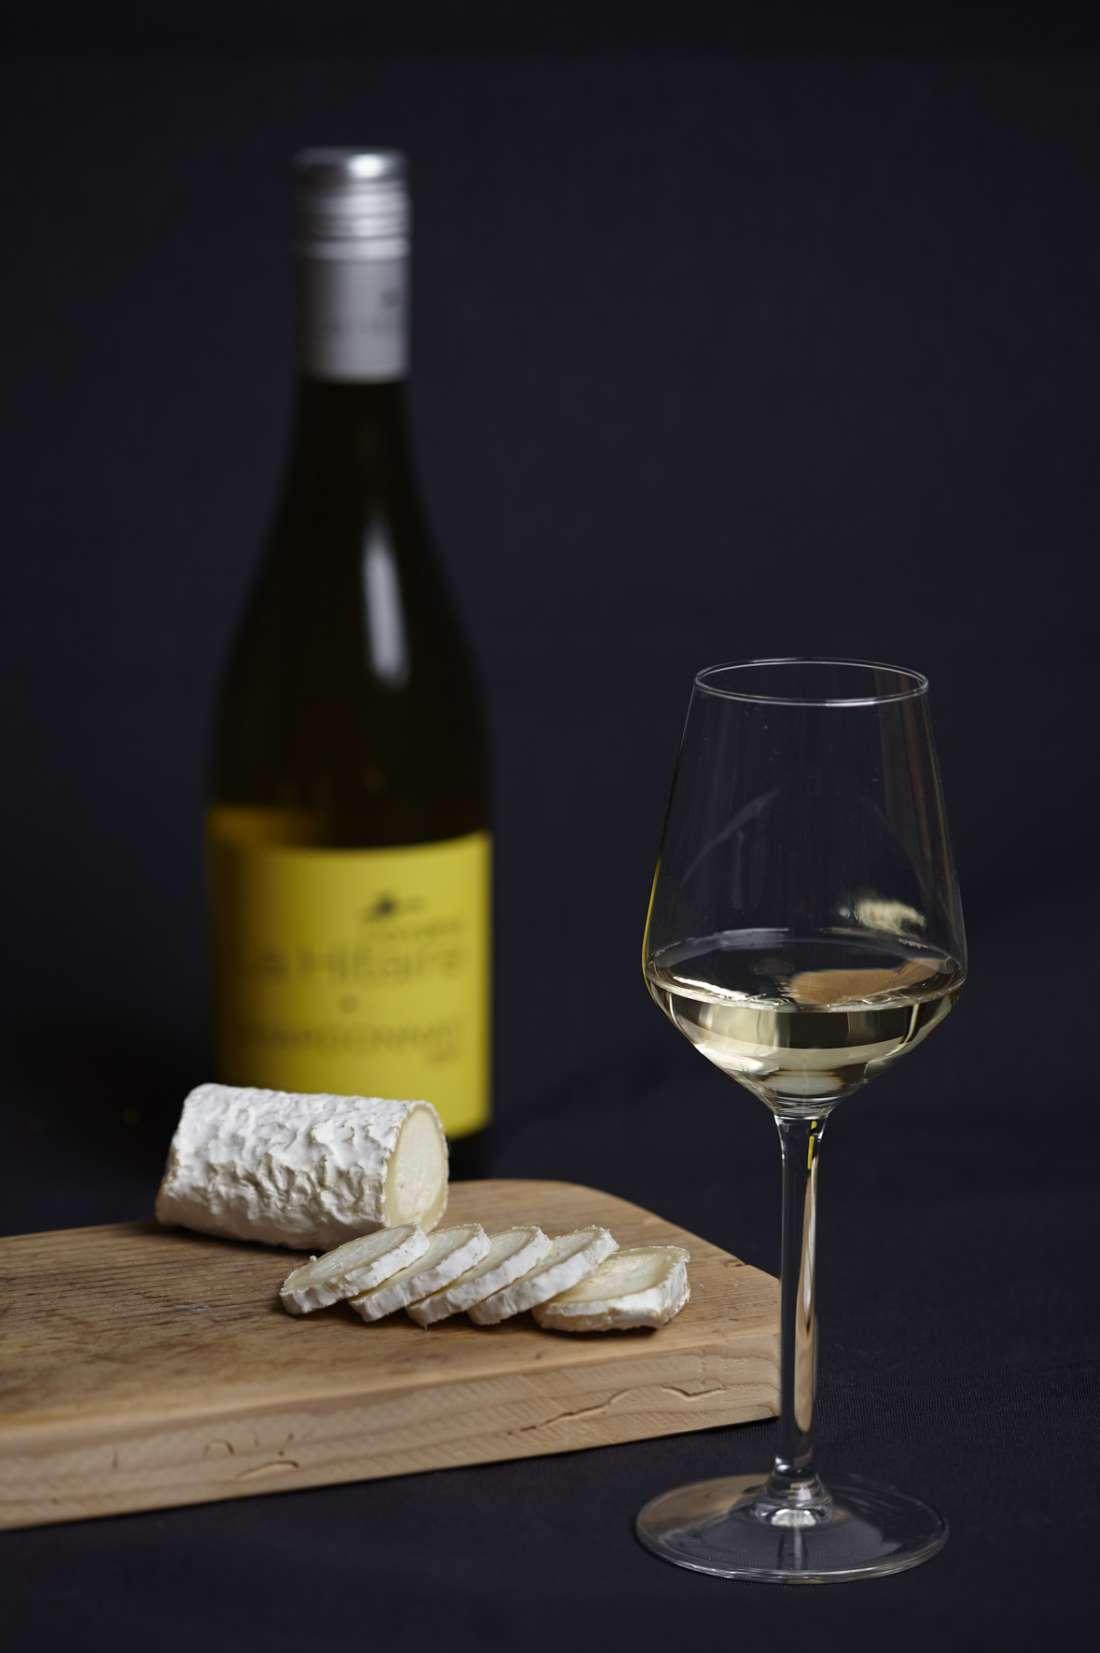 Wijnproeverij thuis geit, Sauvignon blanc